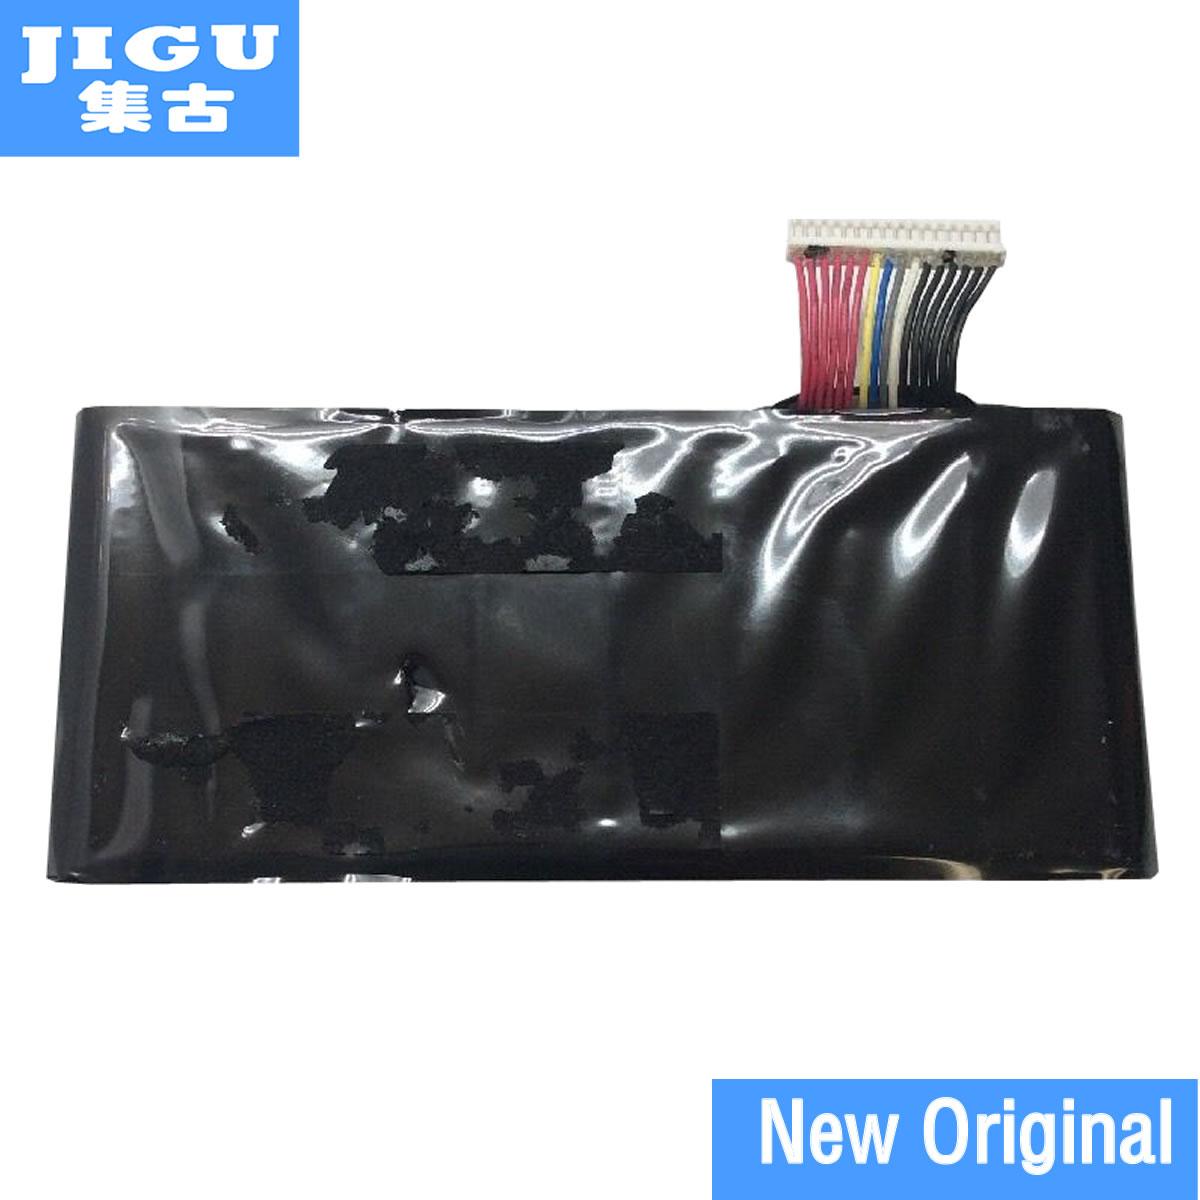 JIGU ORIGNAL laptop battery BTY-L77 FOR MSI 2PE-022CN 2QD-1019XCN 2QD-292XCN 2QE-209CN 2QE-212CN GT72 GT80 MS-1781 WT72 adata classic c906 16gb white